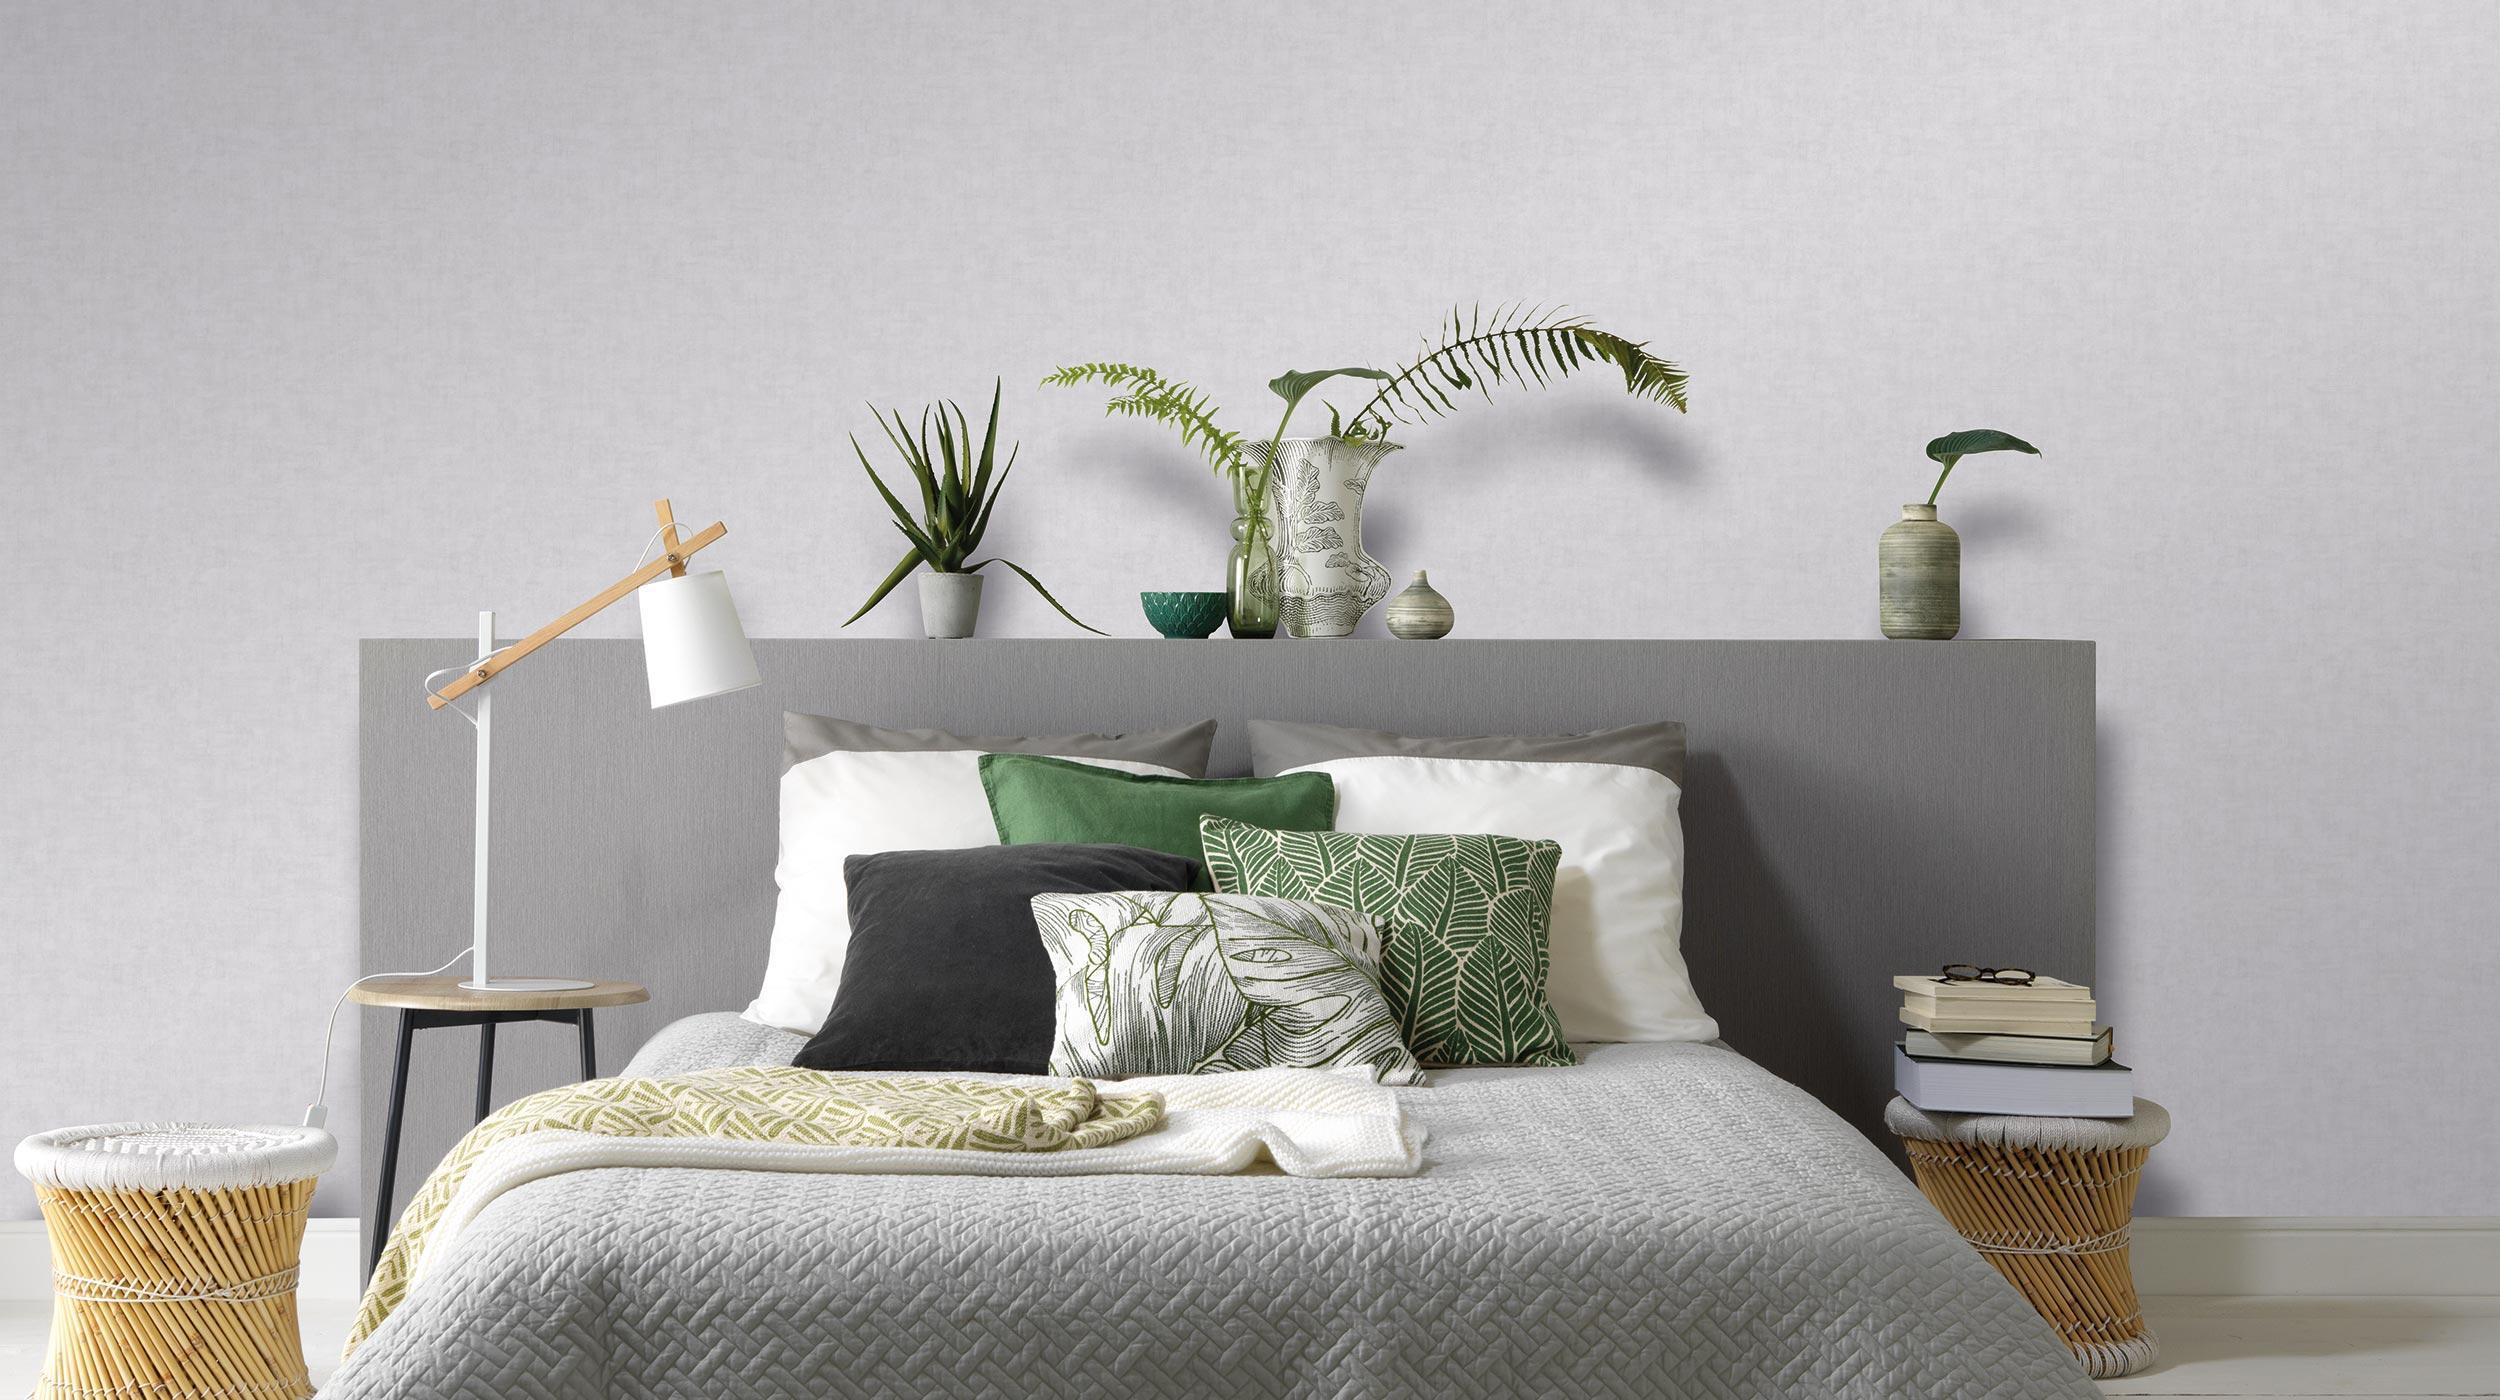 Vliestapete graue Unistruktur in Kalkoptik Kollektion Colour Stories, modernes Schlafzimmer